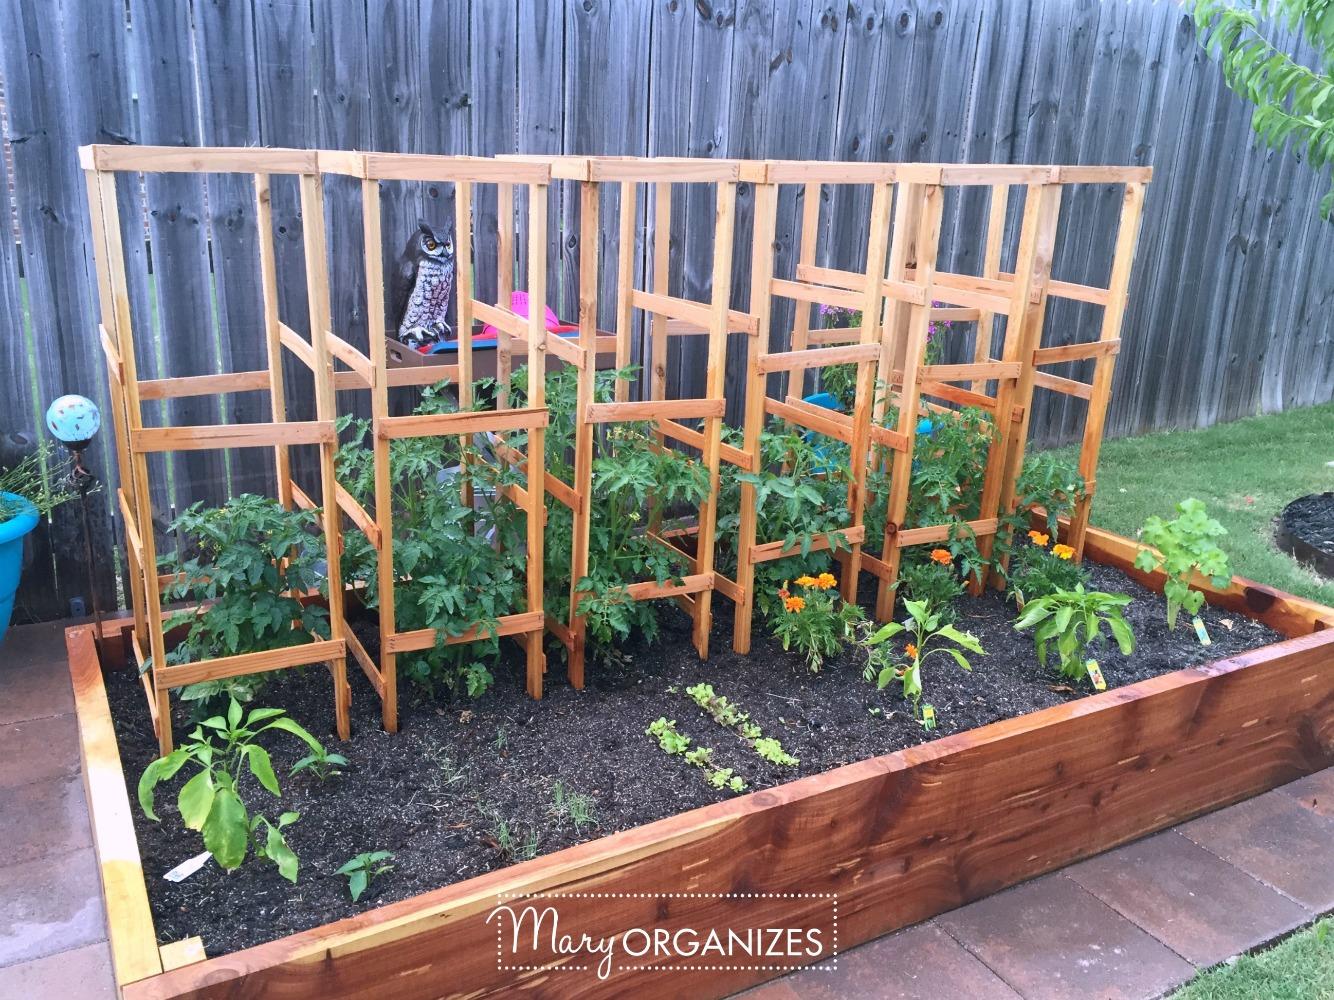 DIY Tomato Cage Tutorial for the Organic Garden 6